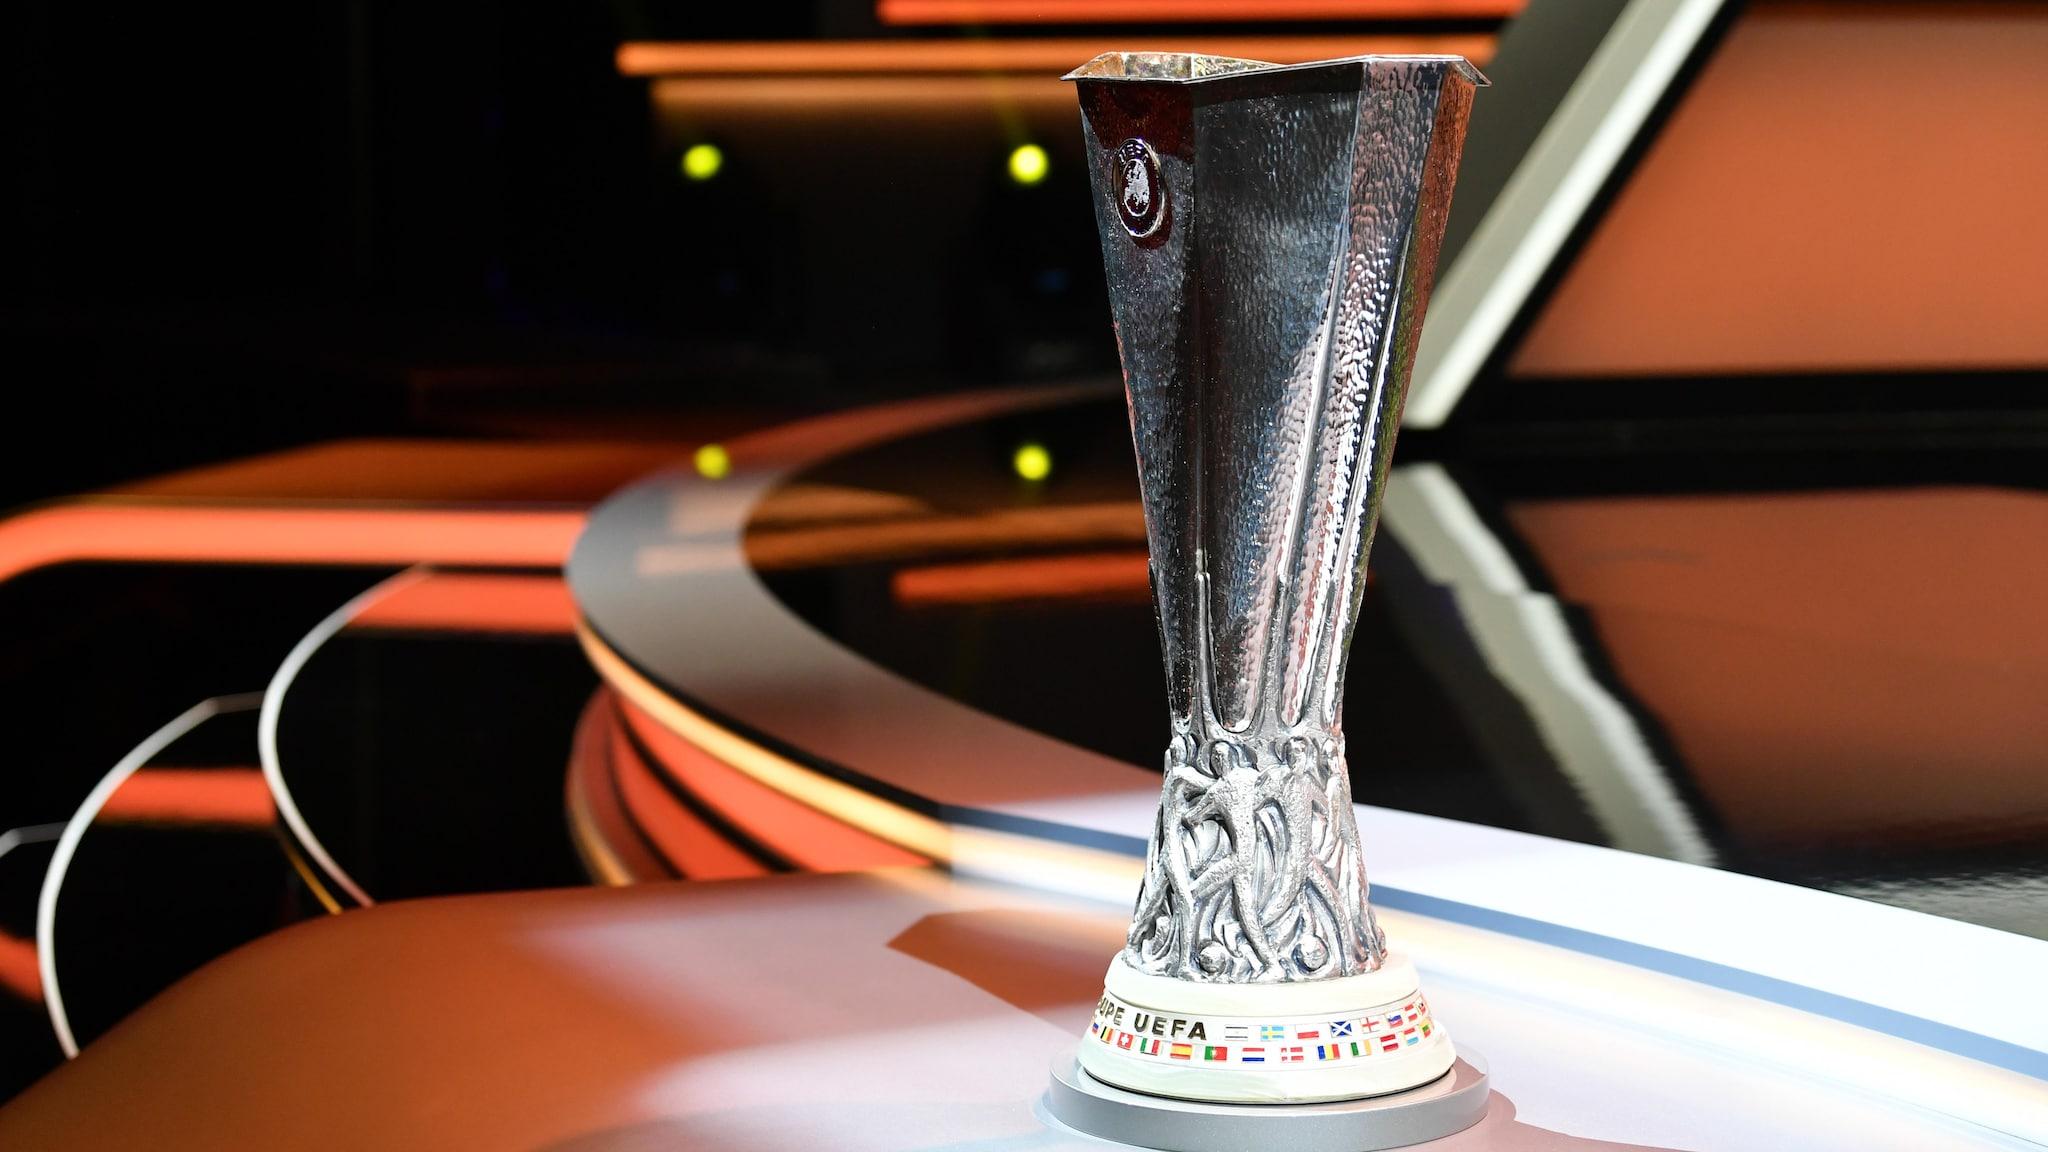 2020 21 uefa europa league all you need to know uefa europa league uefa com uefa com